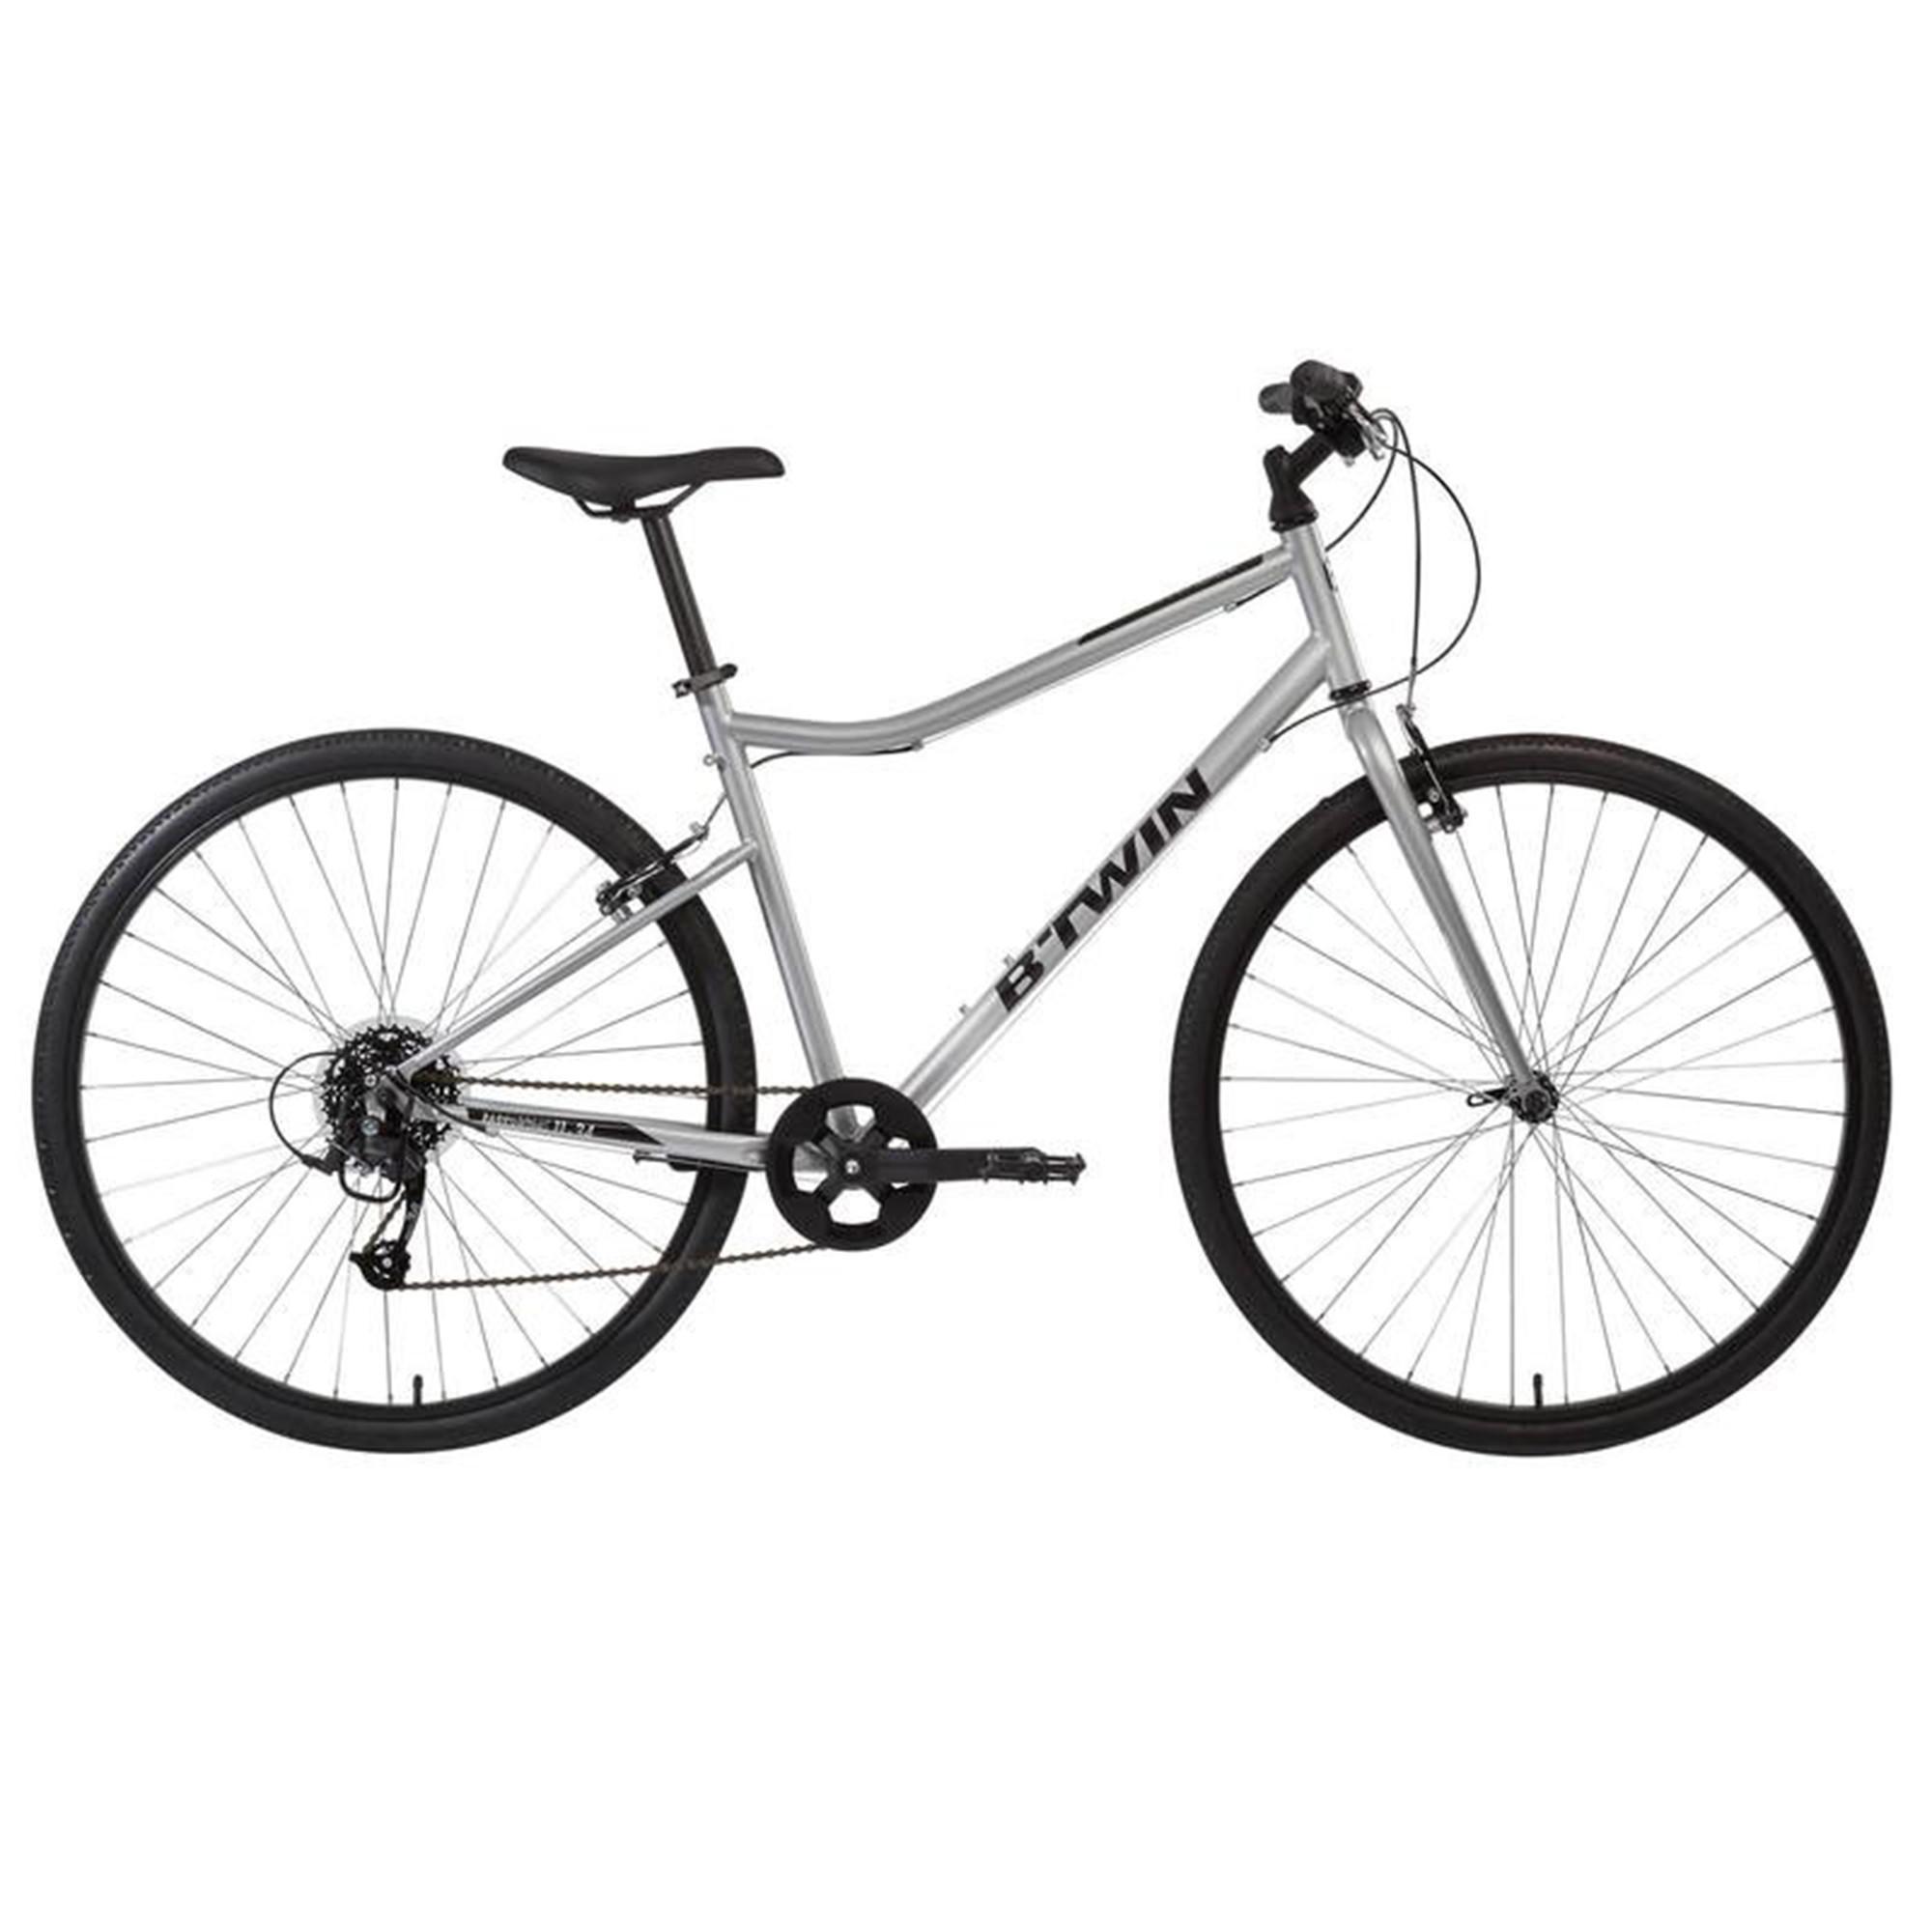 Btwin Riverside 120 Hybrid Cycle